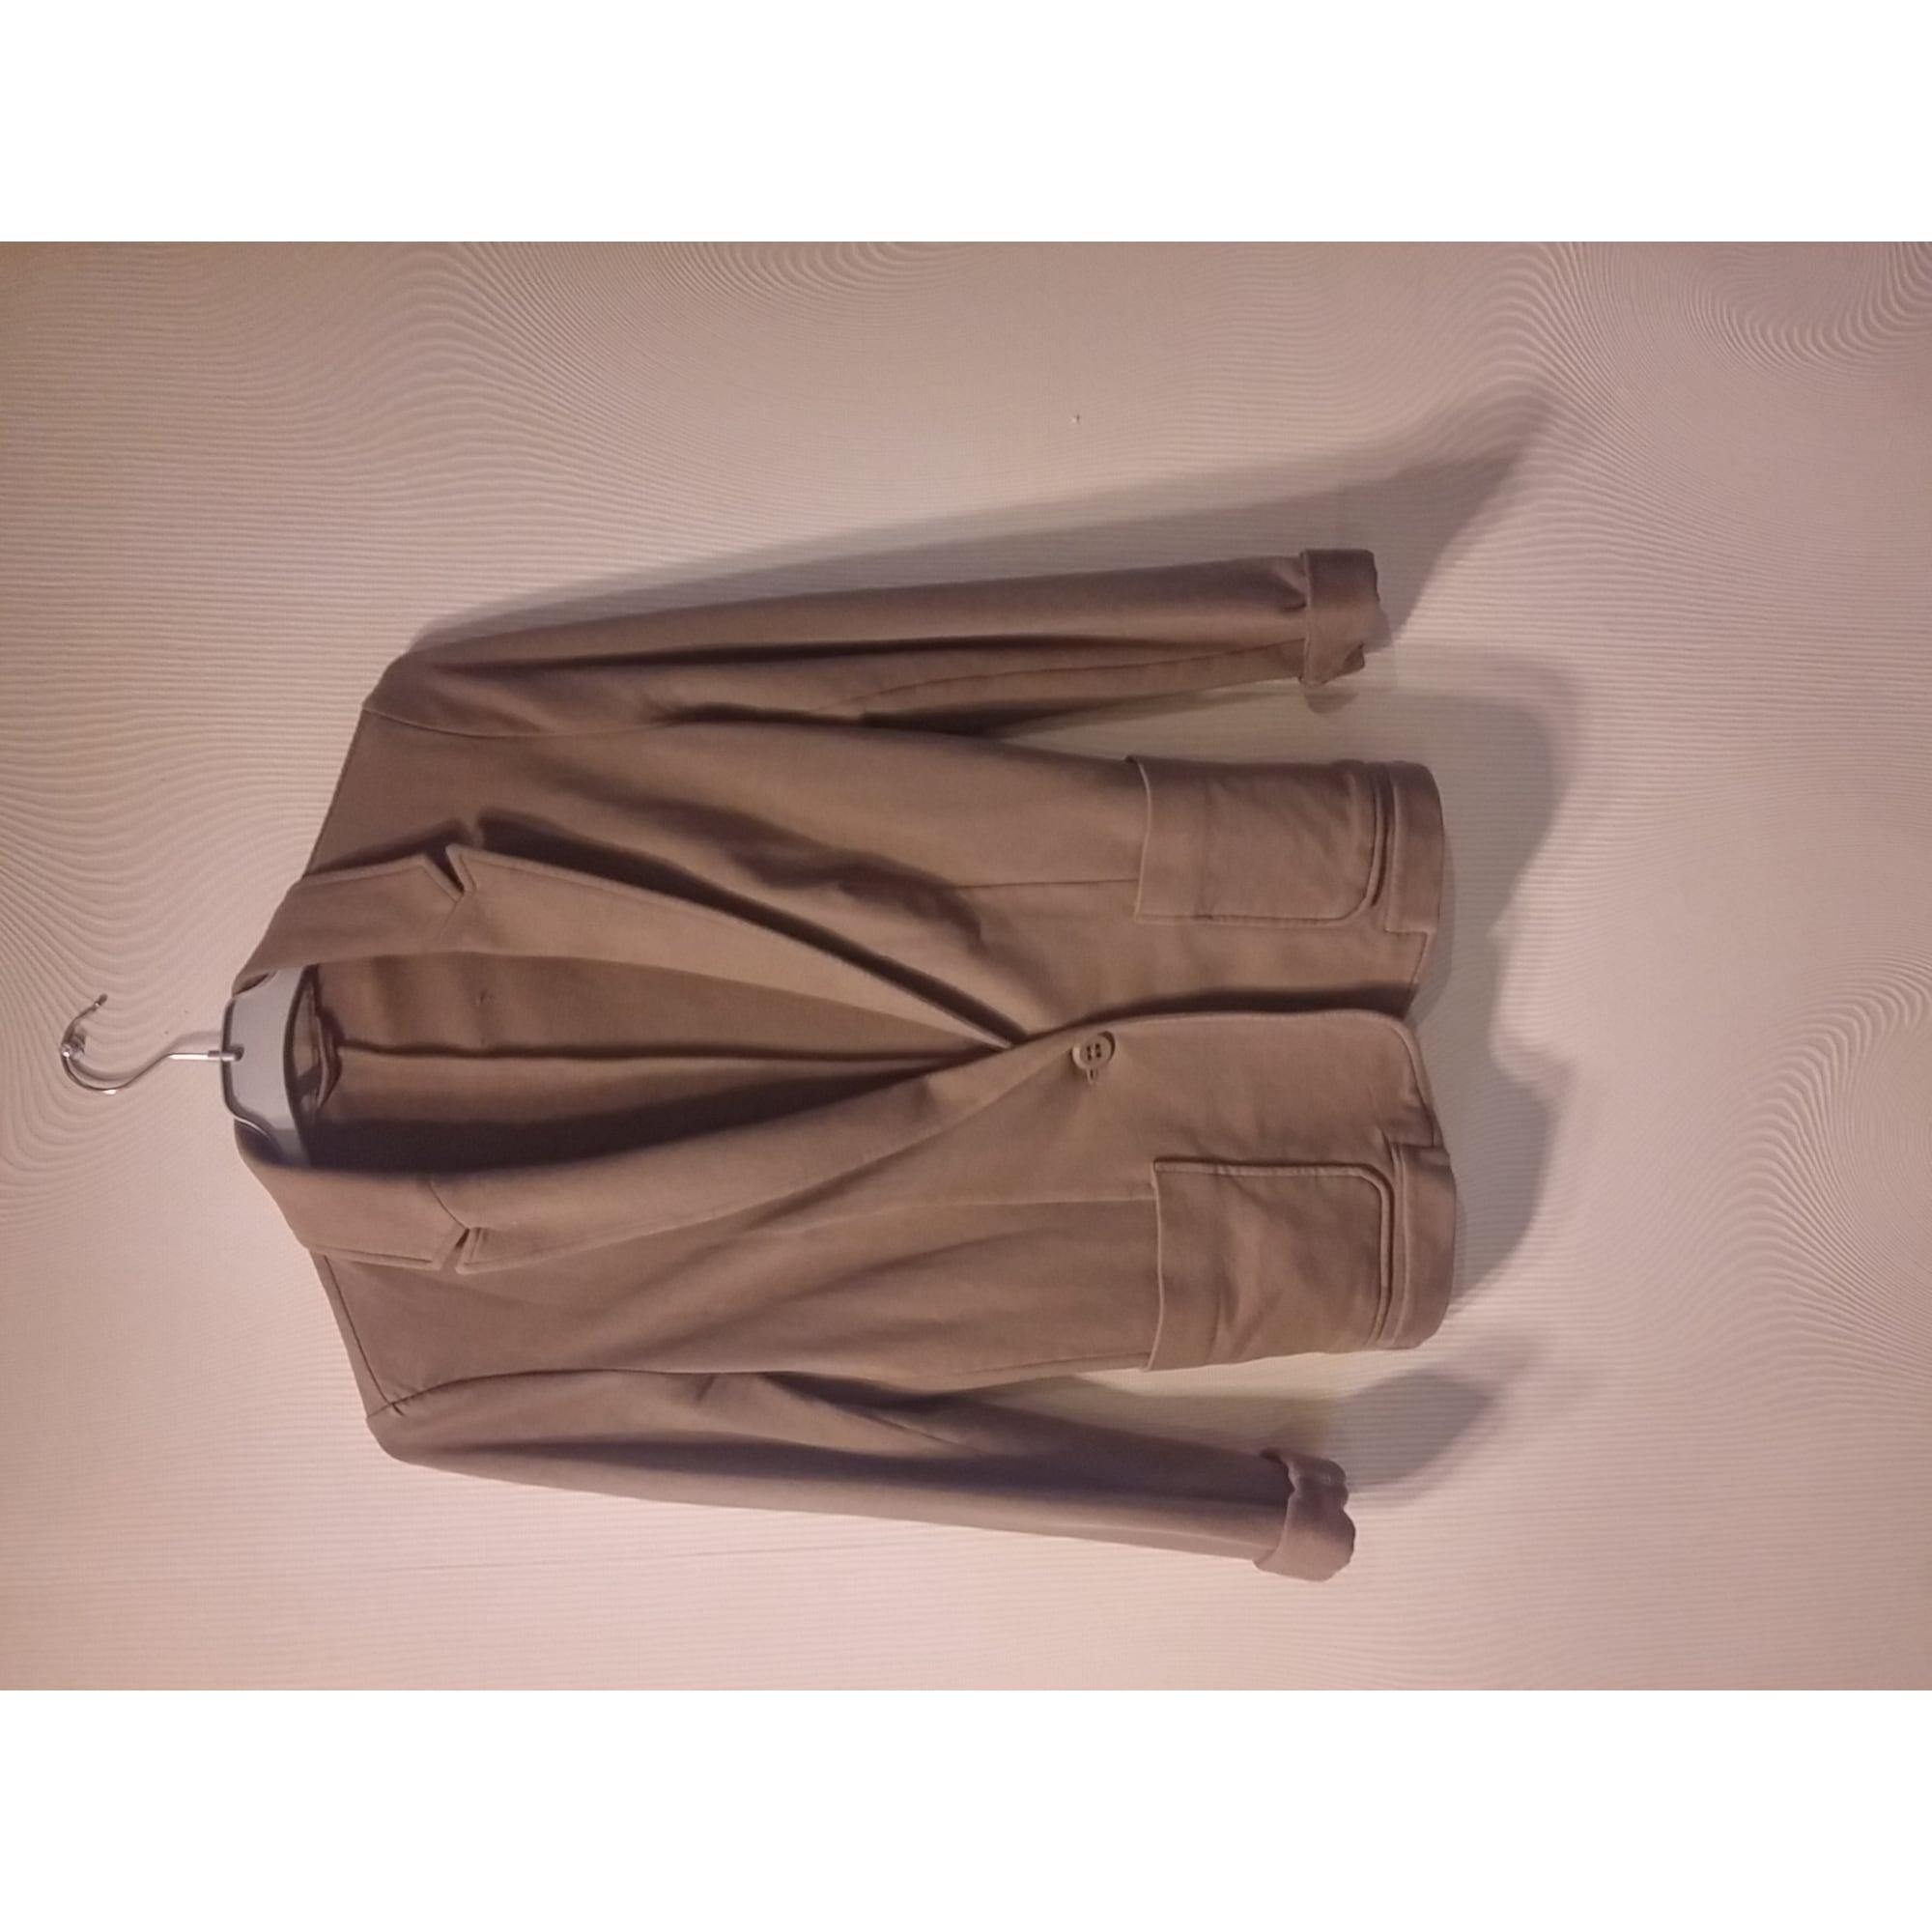 Blazer, veste tailleur BENETTON taupe